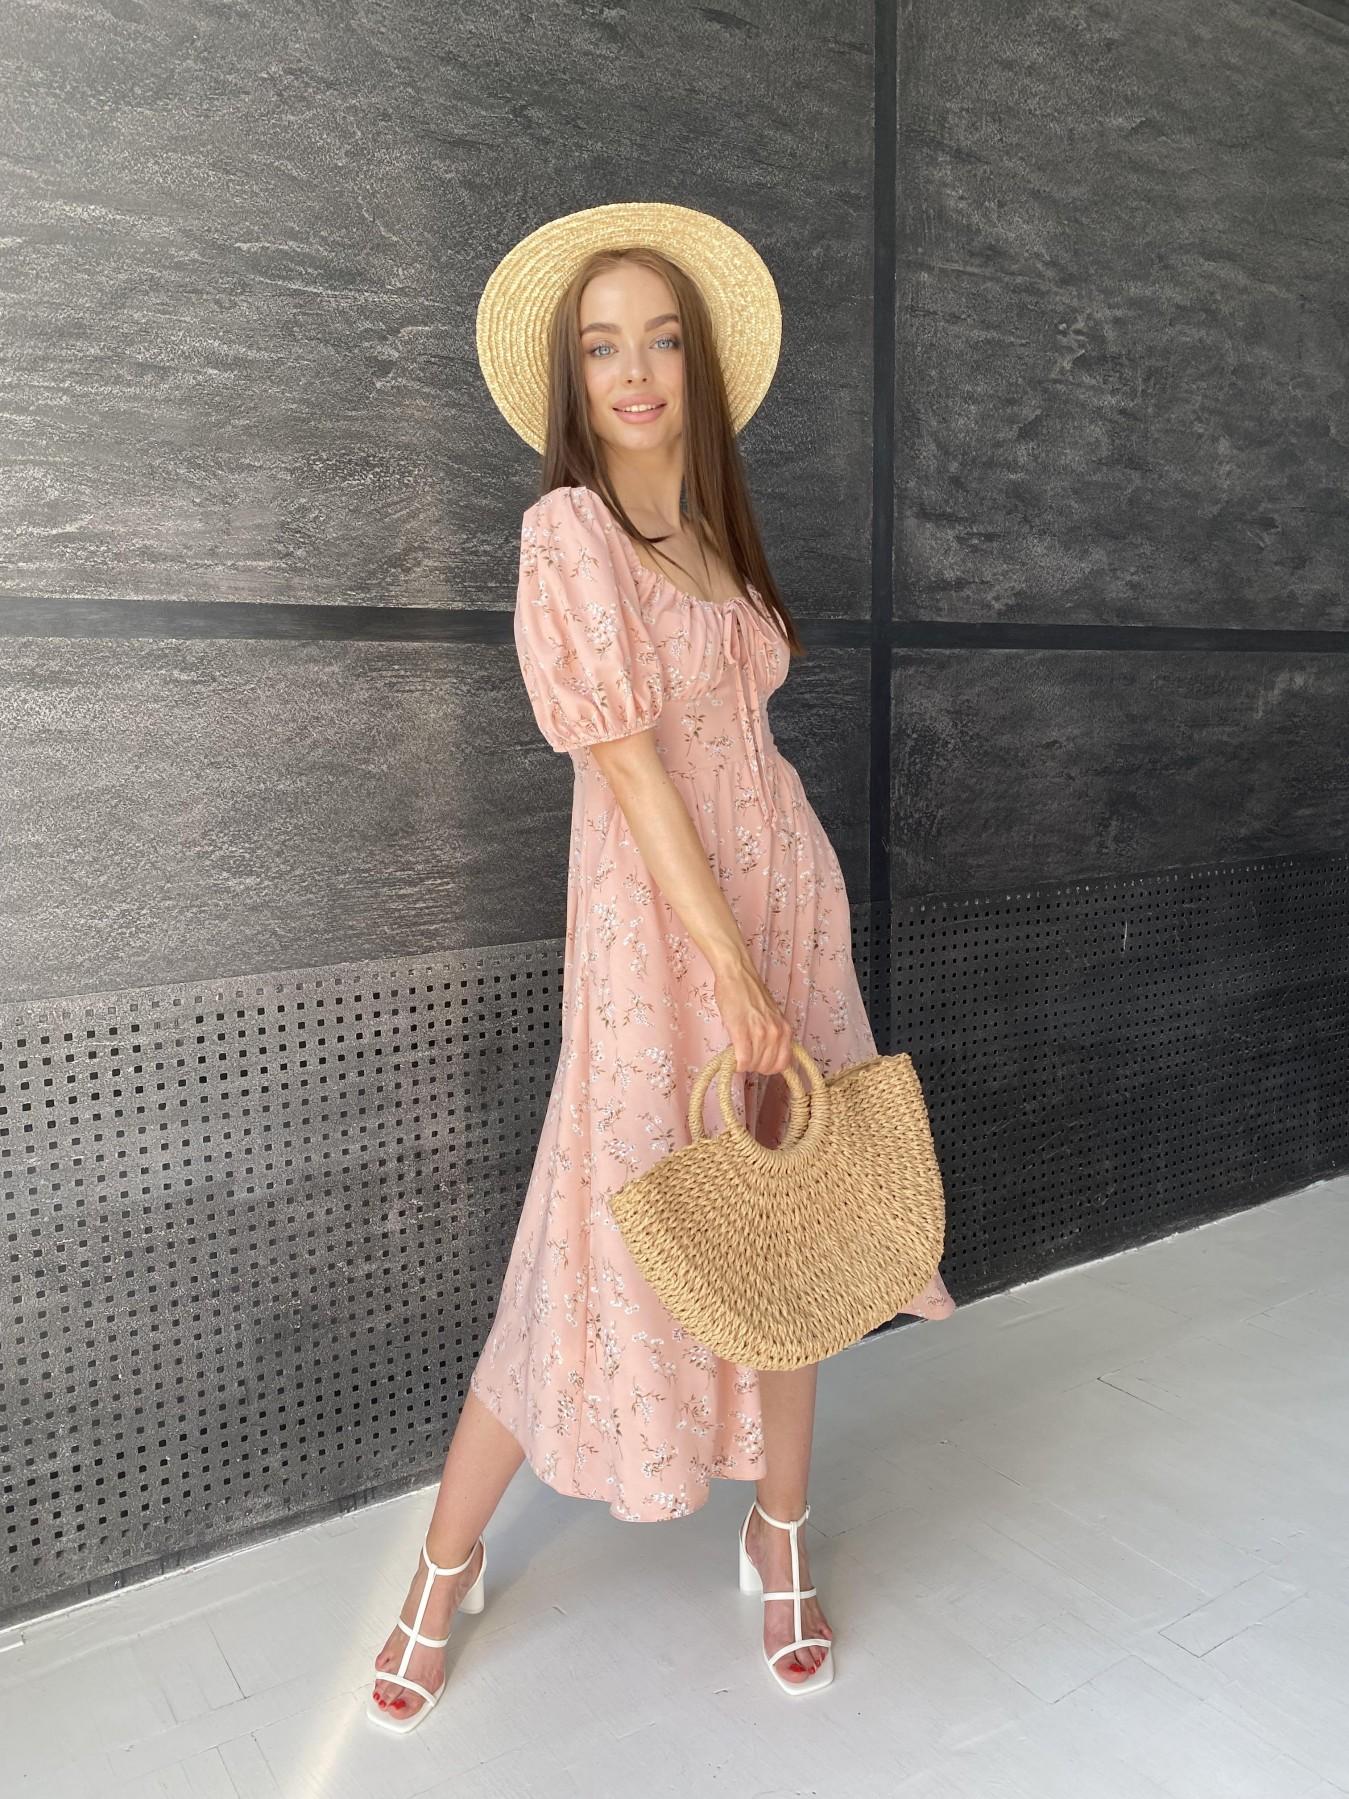 Кисес Миди платье из софт ткани в принт 11348 АРТ. 48150 Цвет: Пудра/букетики/бел/зел - фото 3, интернет магазин tm-modus.ru